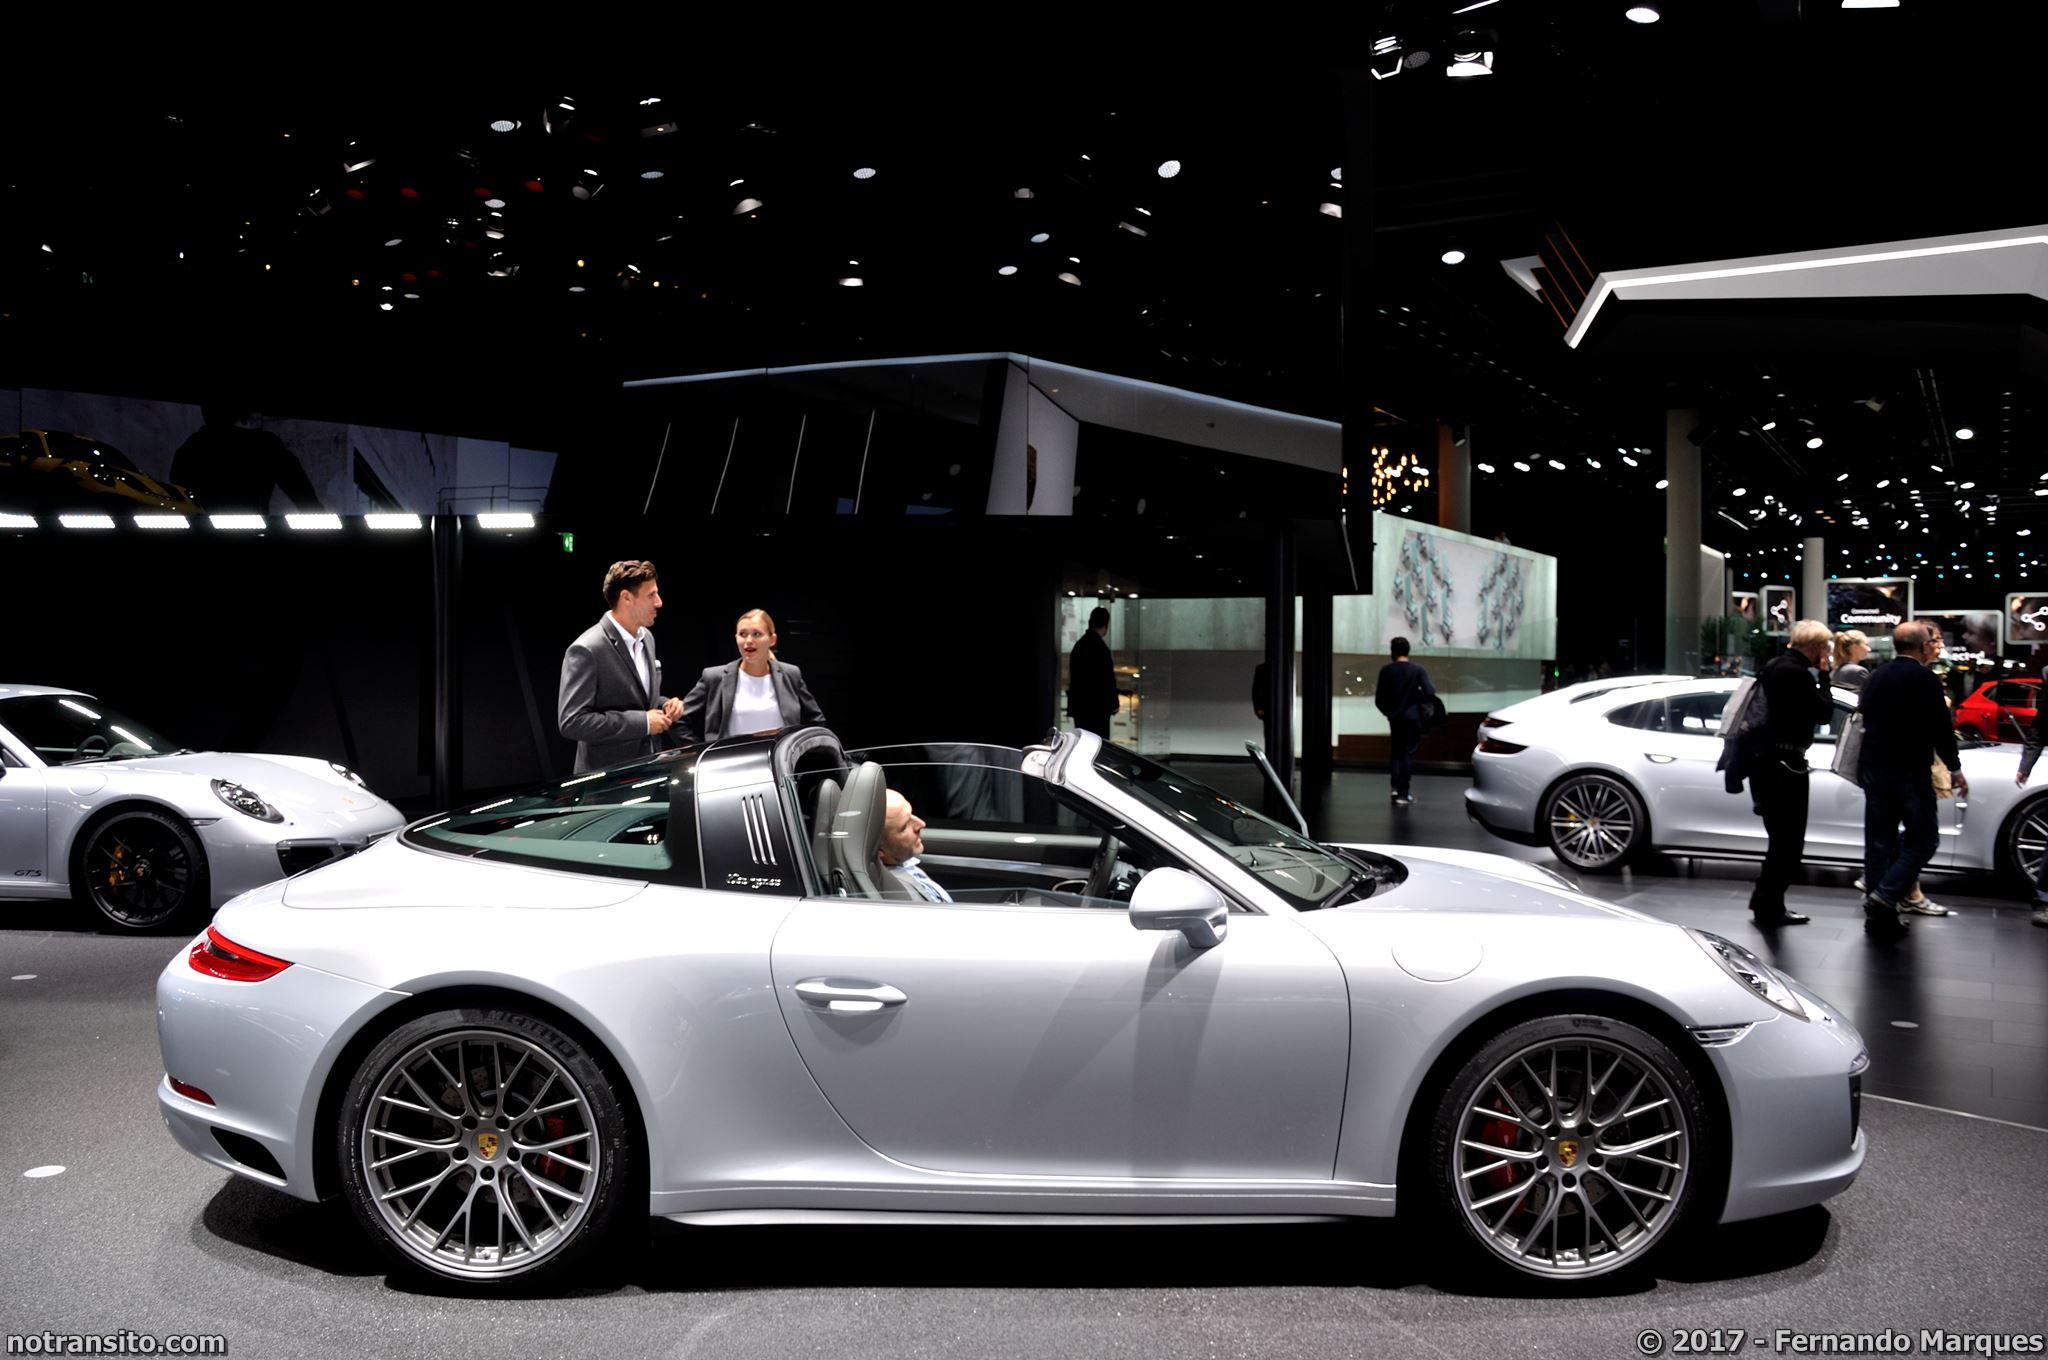 Porsche-911-Targa-4S-Frankfurt-2017-003